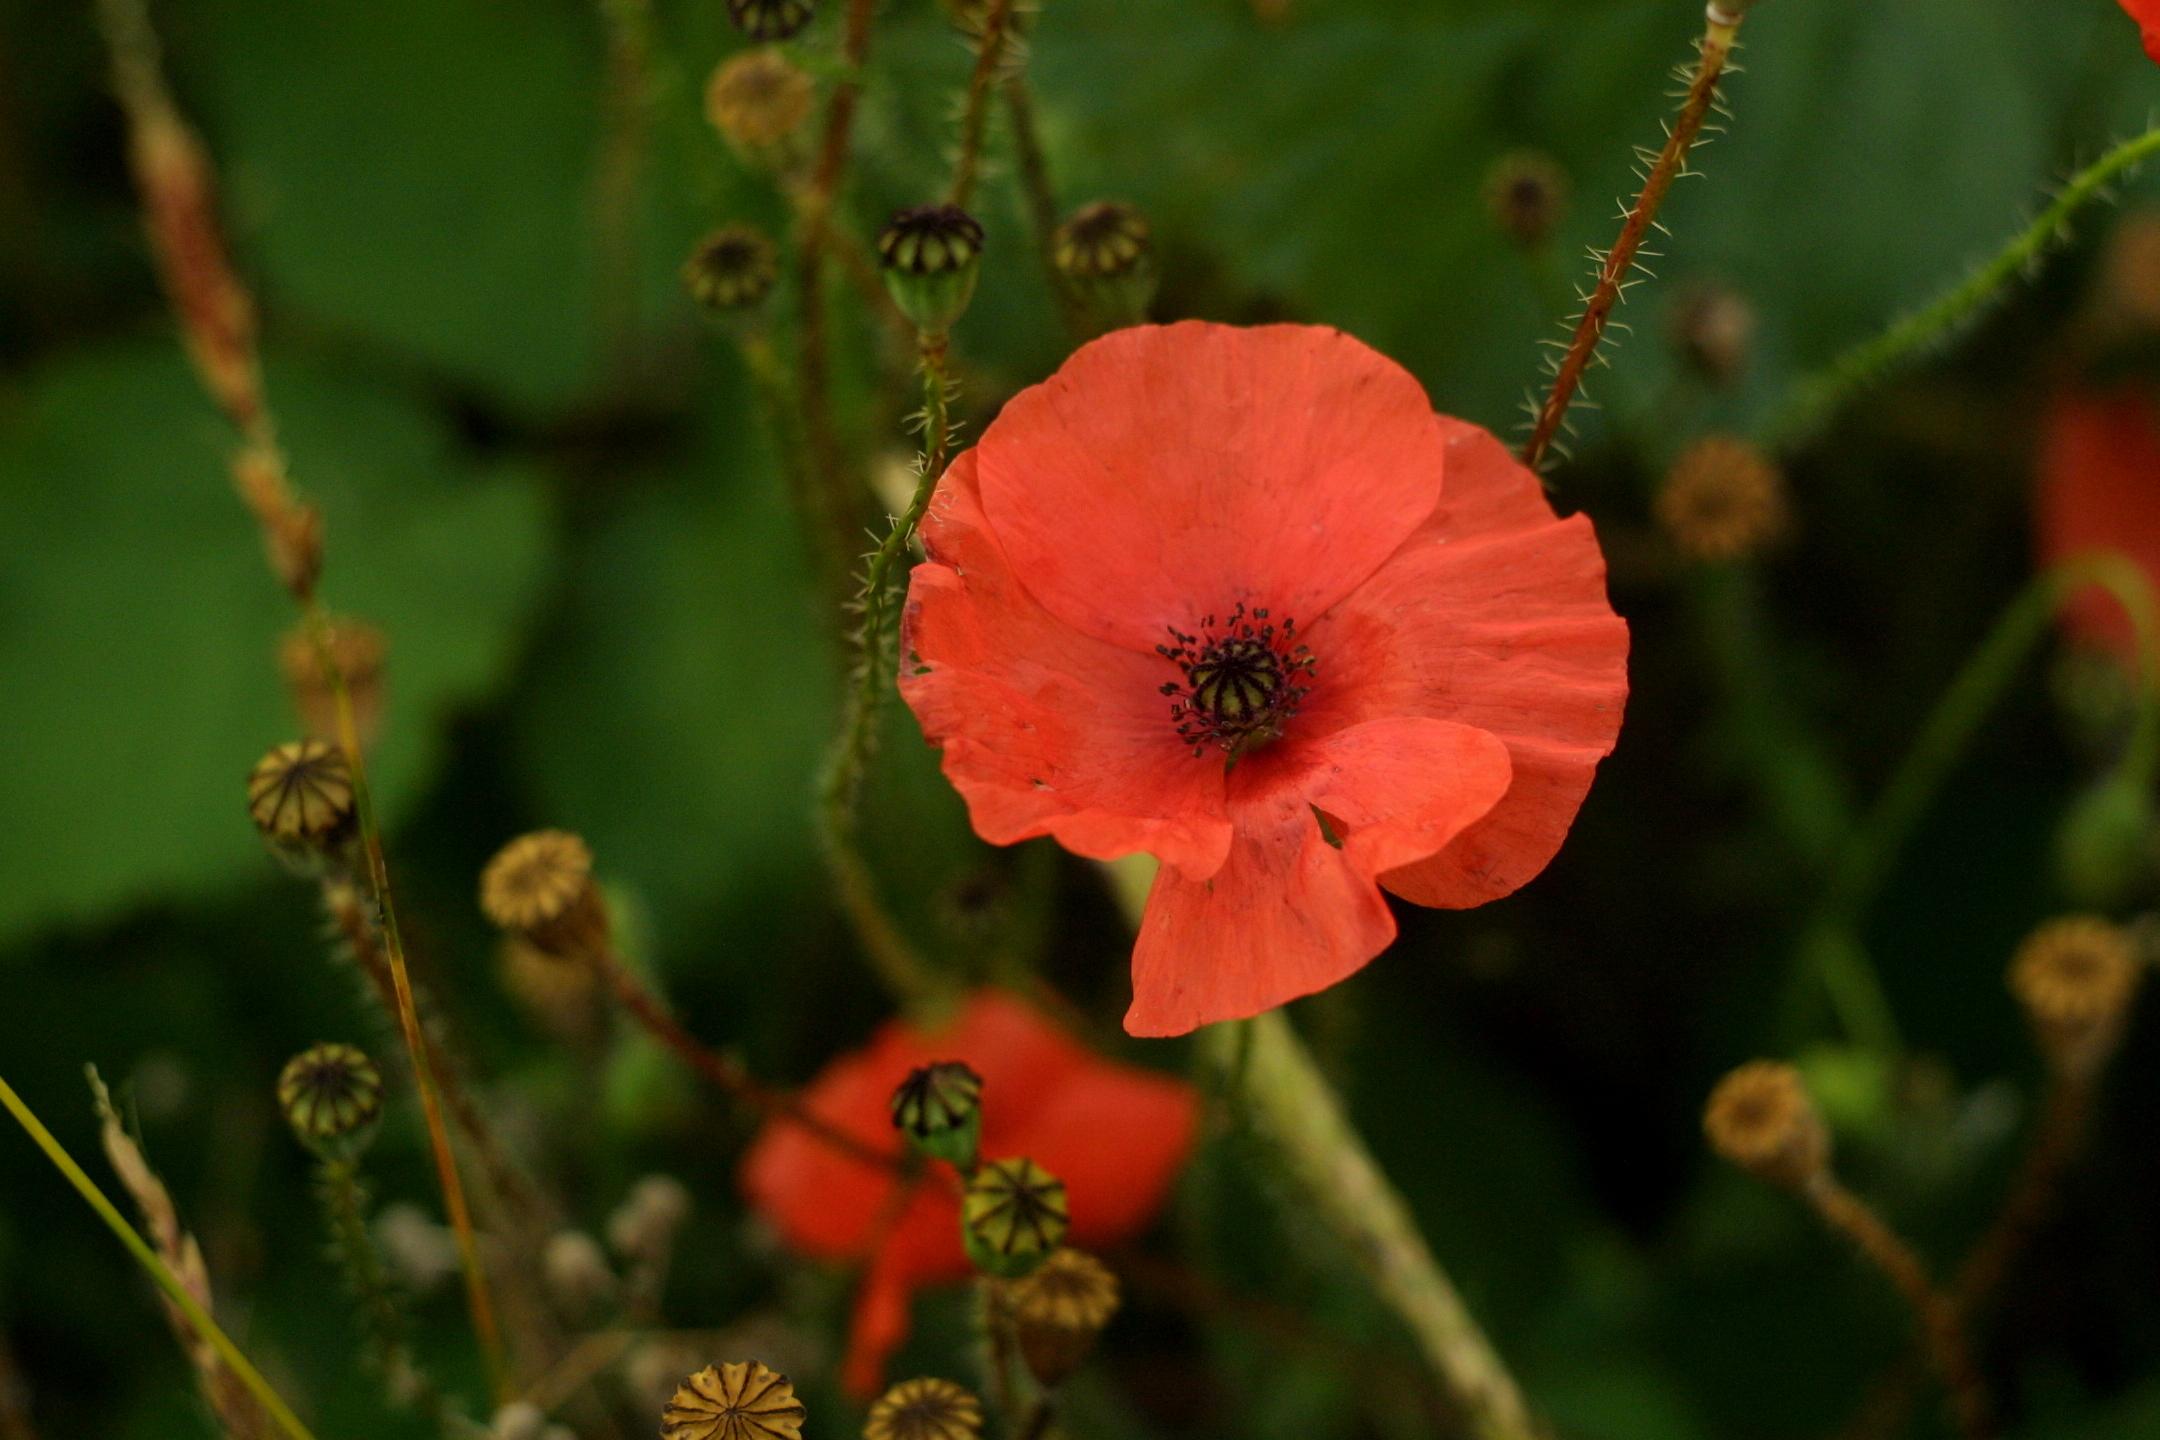 wild poppy flowers on - photo #7